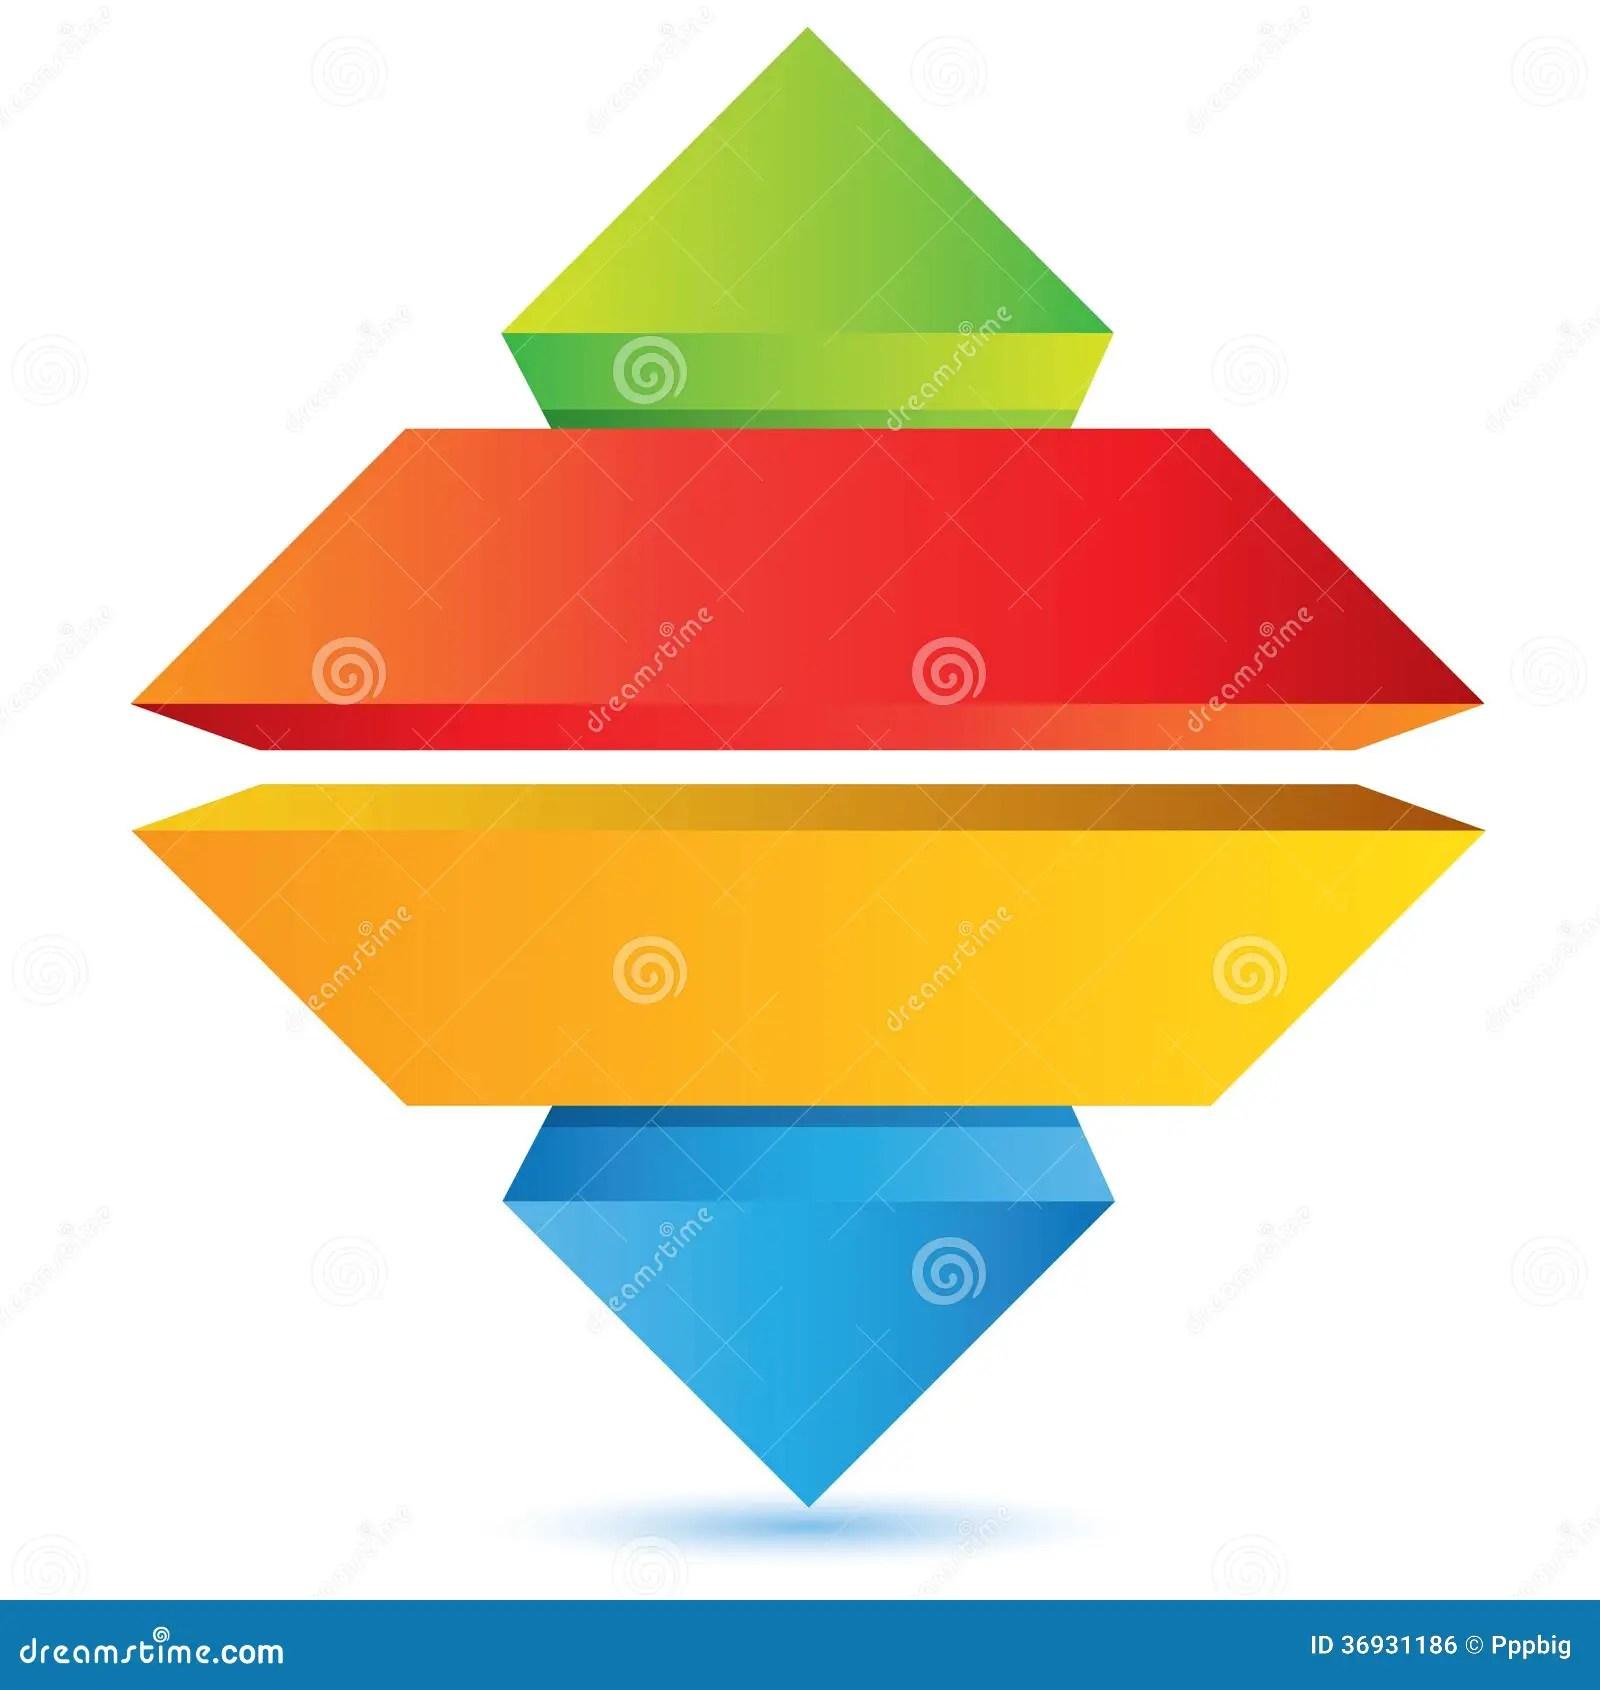 blank pyramid diagram 5 automotive wiring symbols uk christopherbathum co